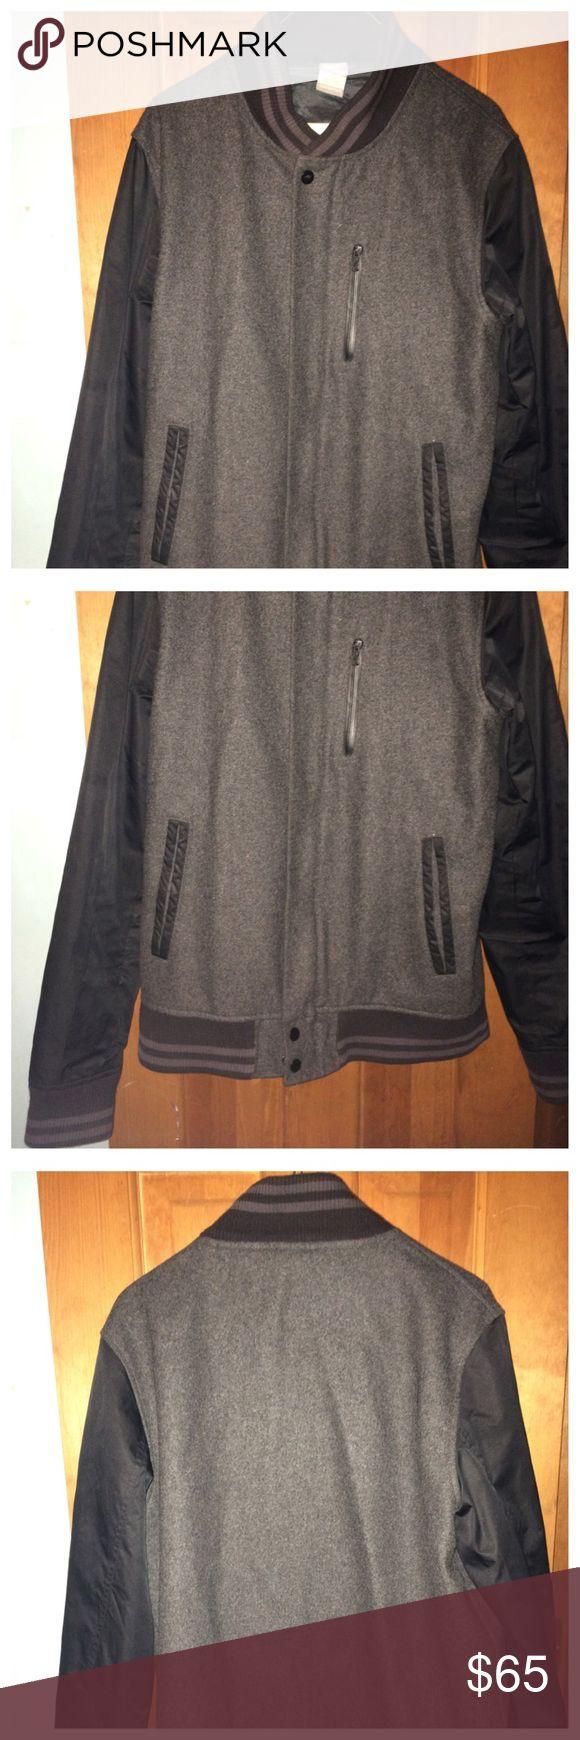 Nike varsity jacket Used gently worn good condition.. no marks rips or stains Nike Jackets & Coats Bomber & Varsity